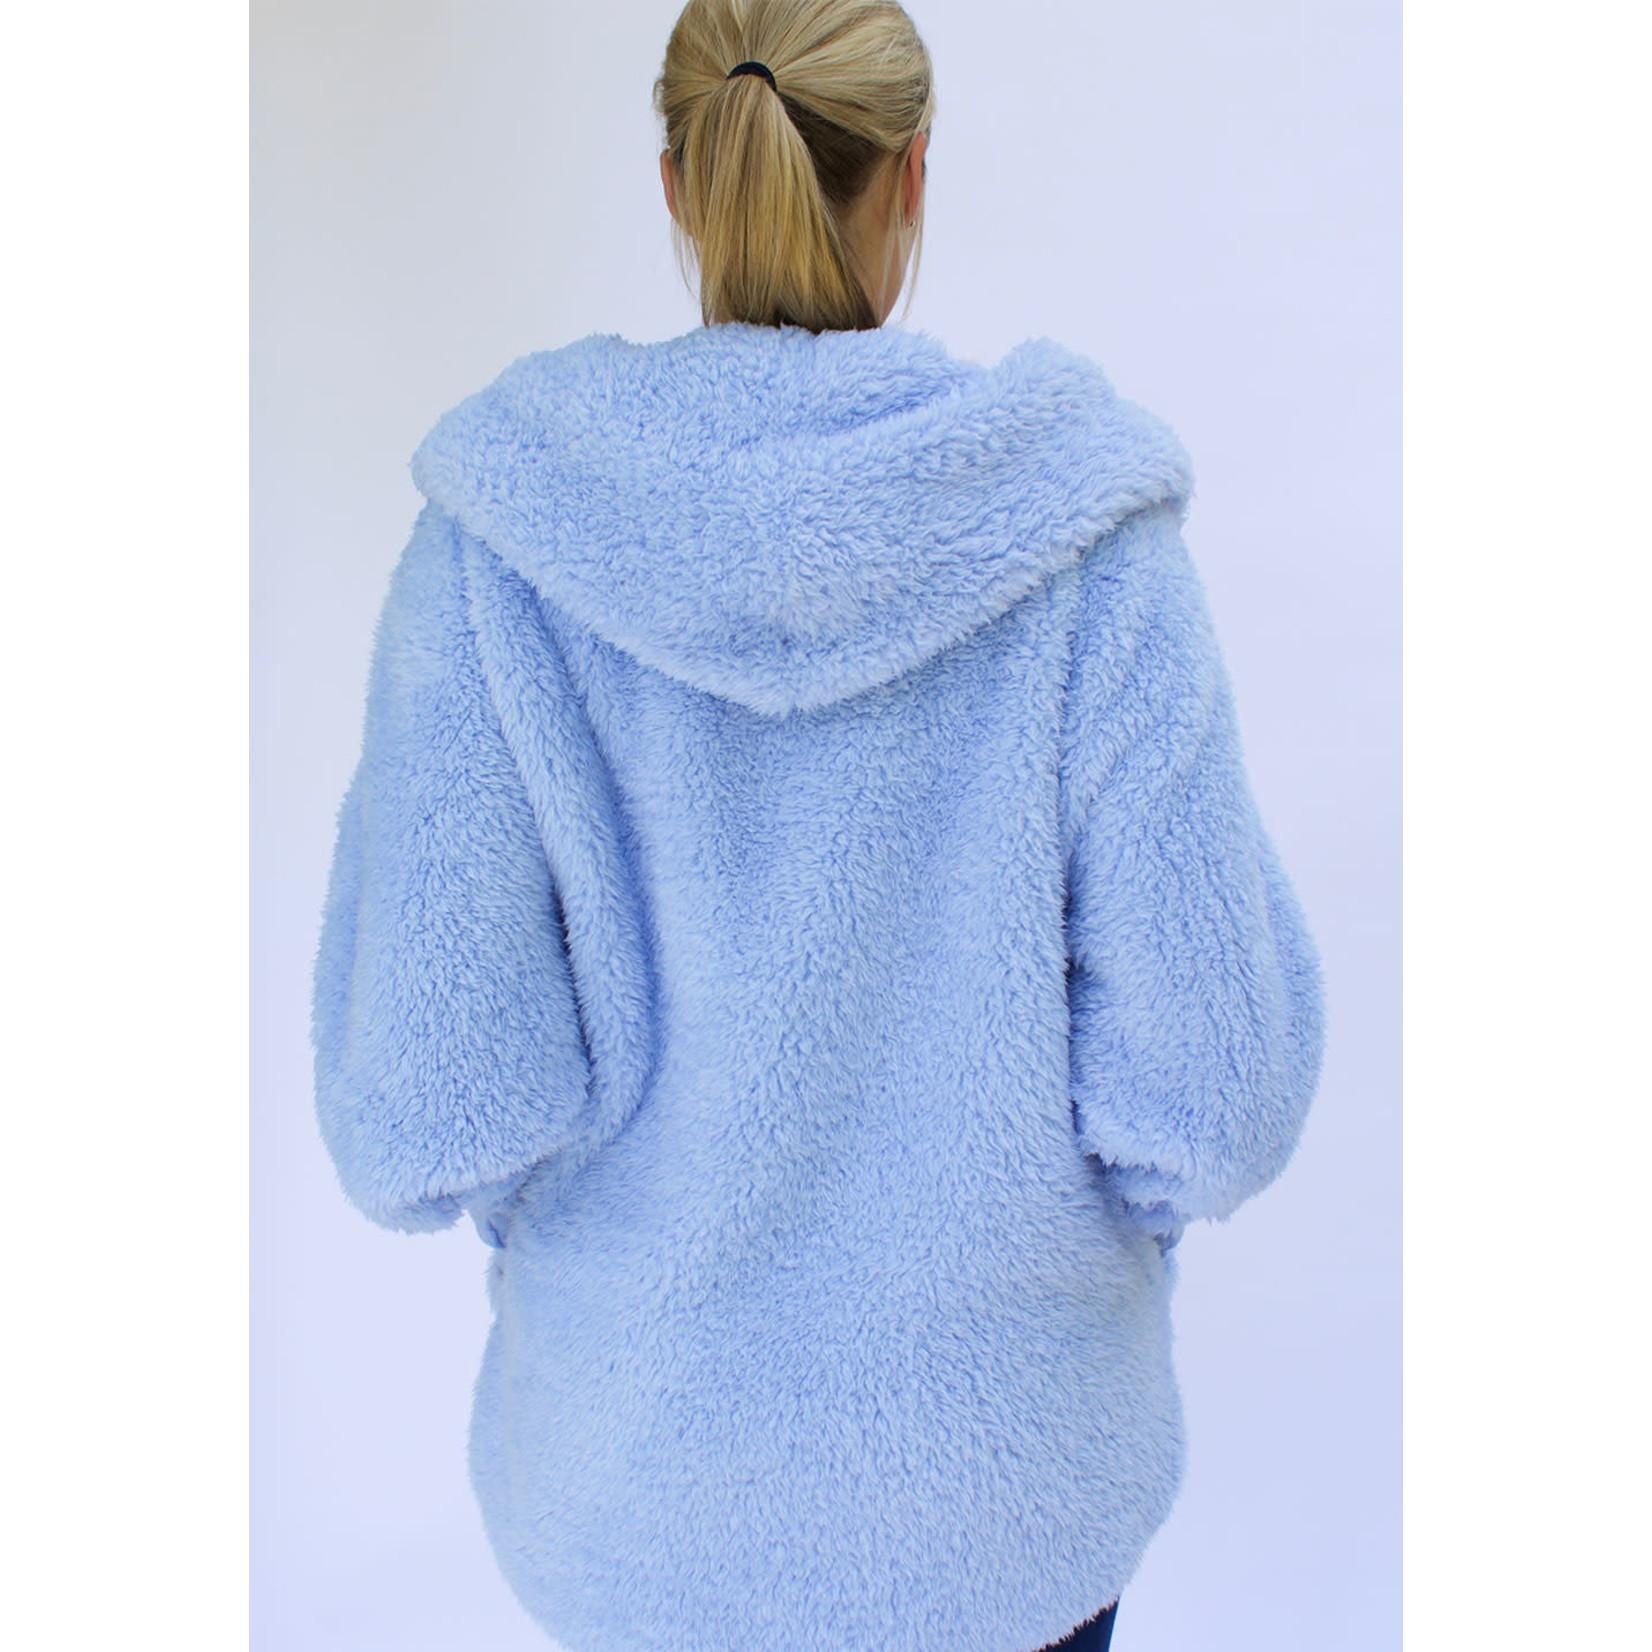 Nordic Beach Fuzzy Fleece Hooded Cardigan in Cashmere Blue